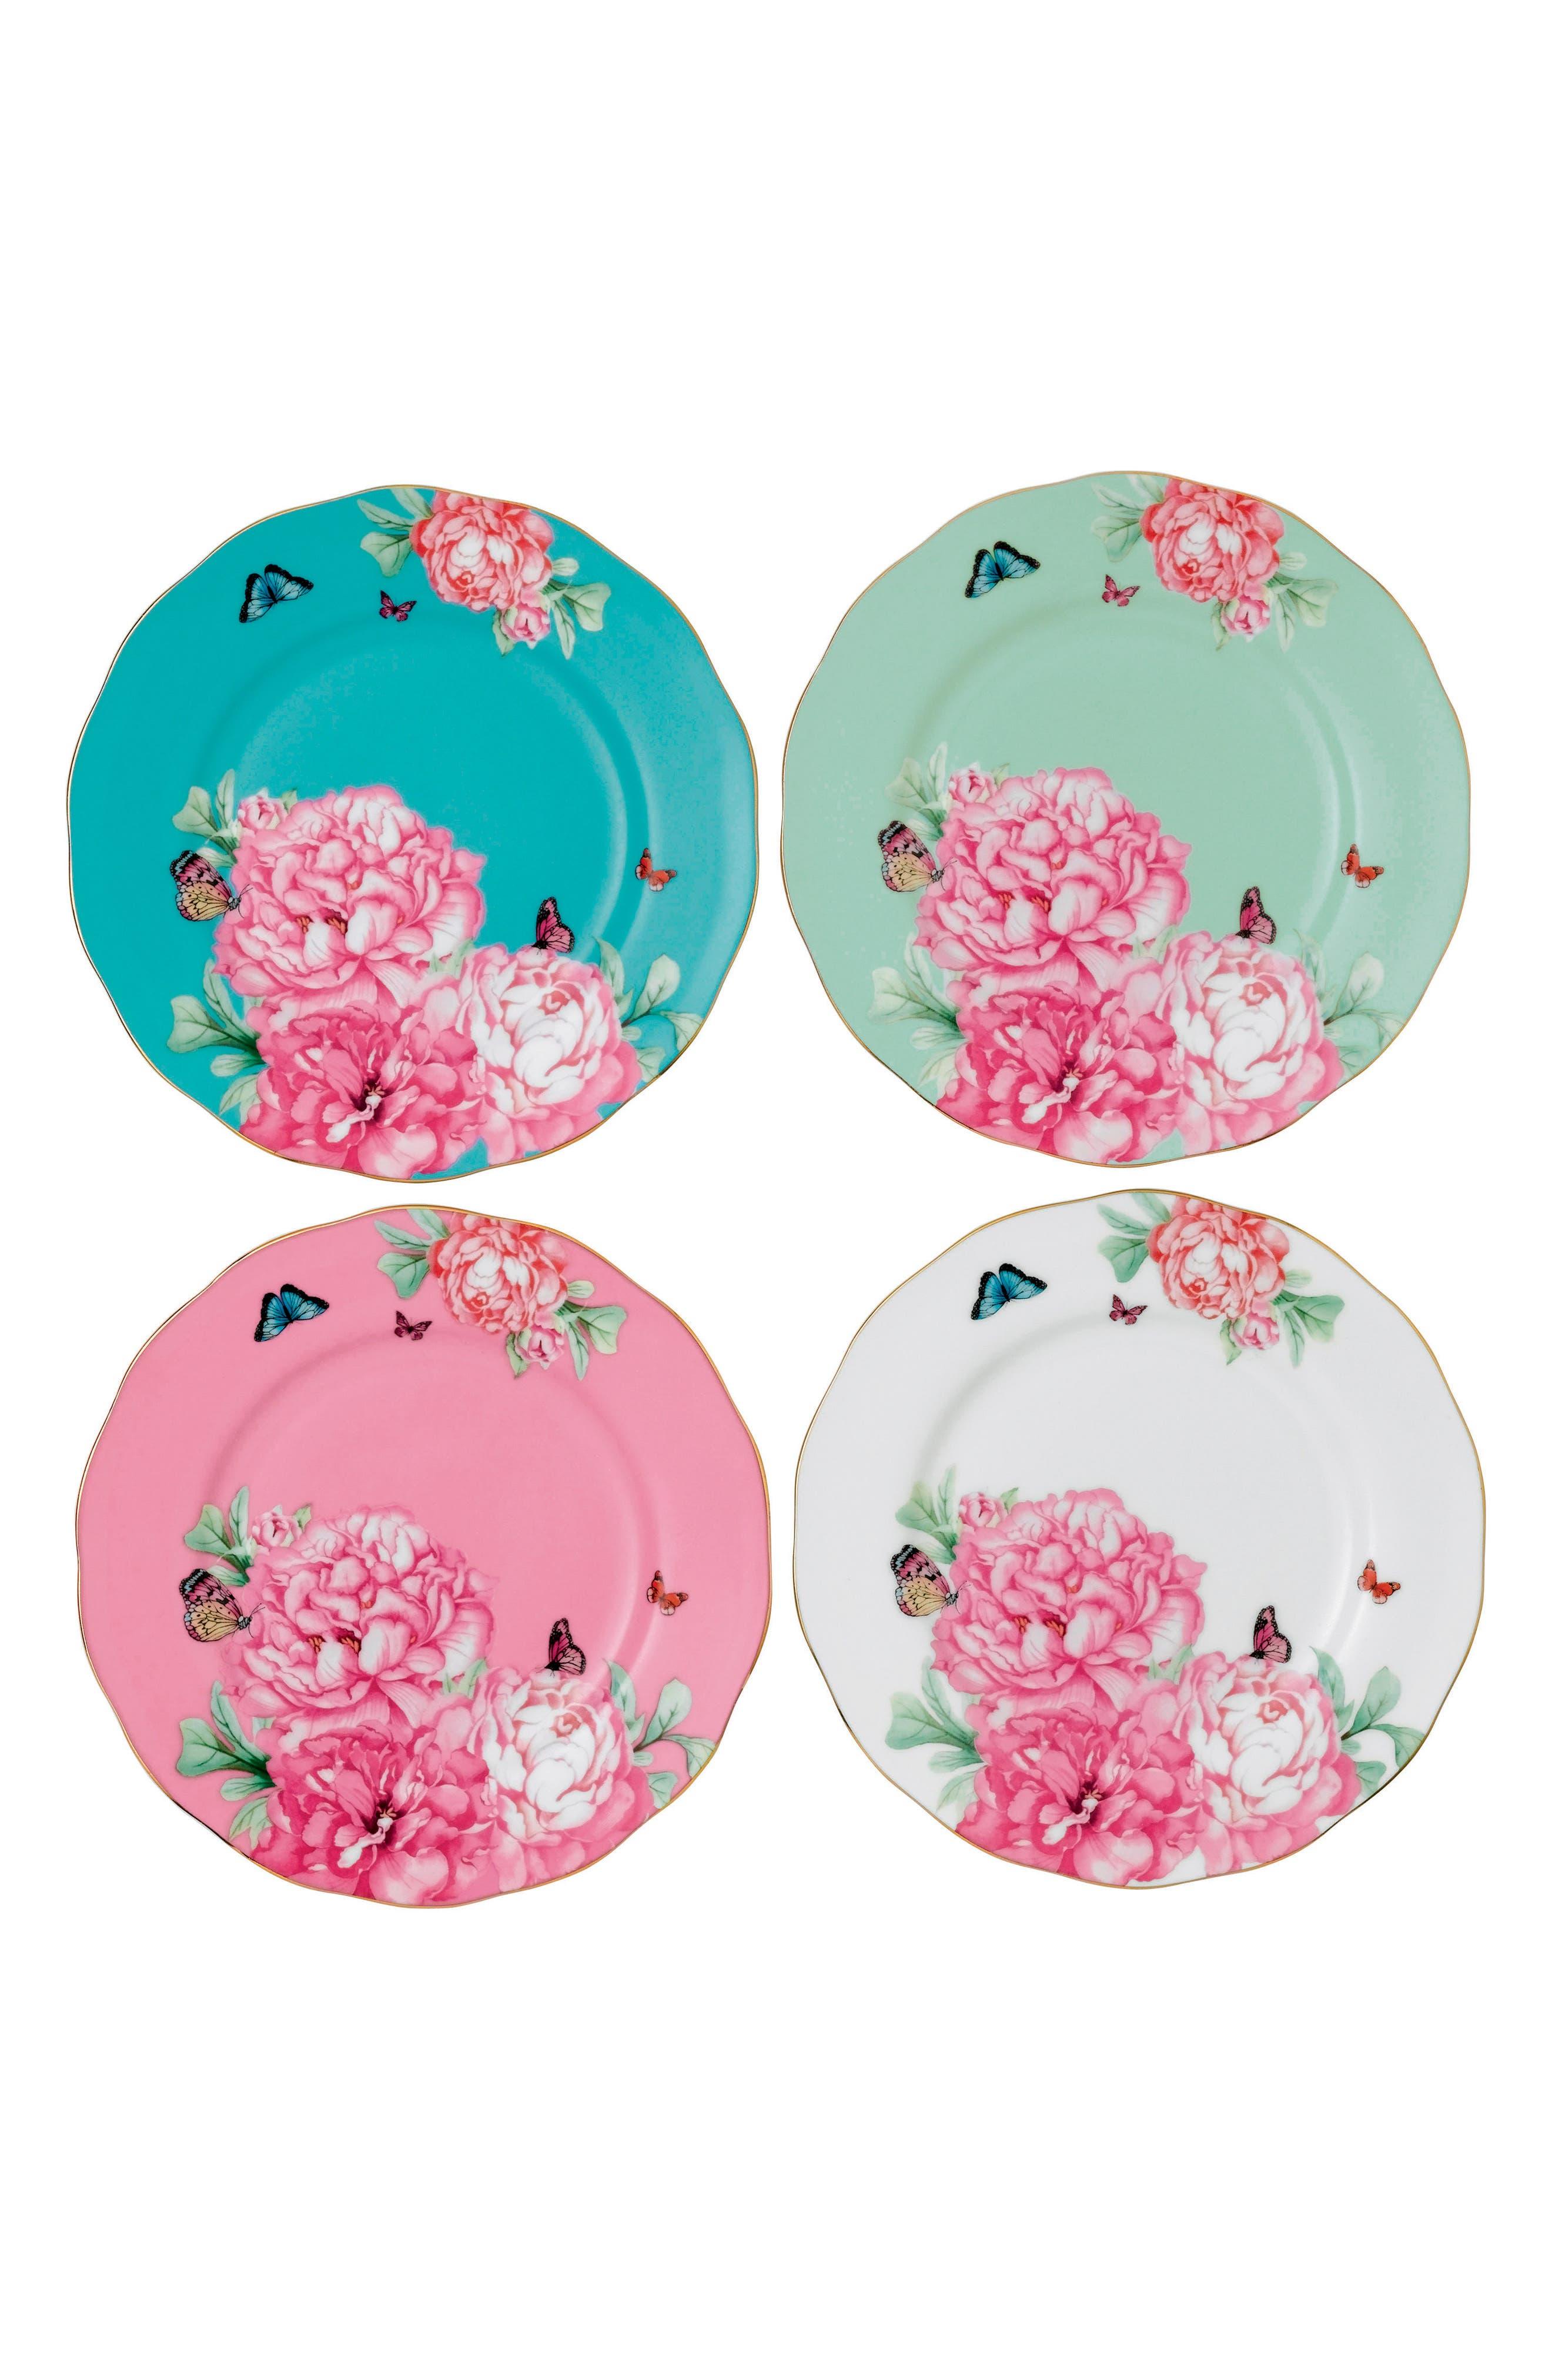 Friendship Set of 4 Accent Plates,                             Main thumbnail 1, color,                             Multi